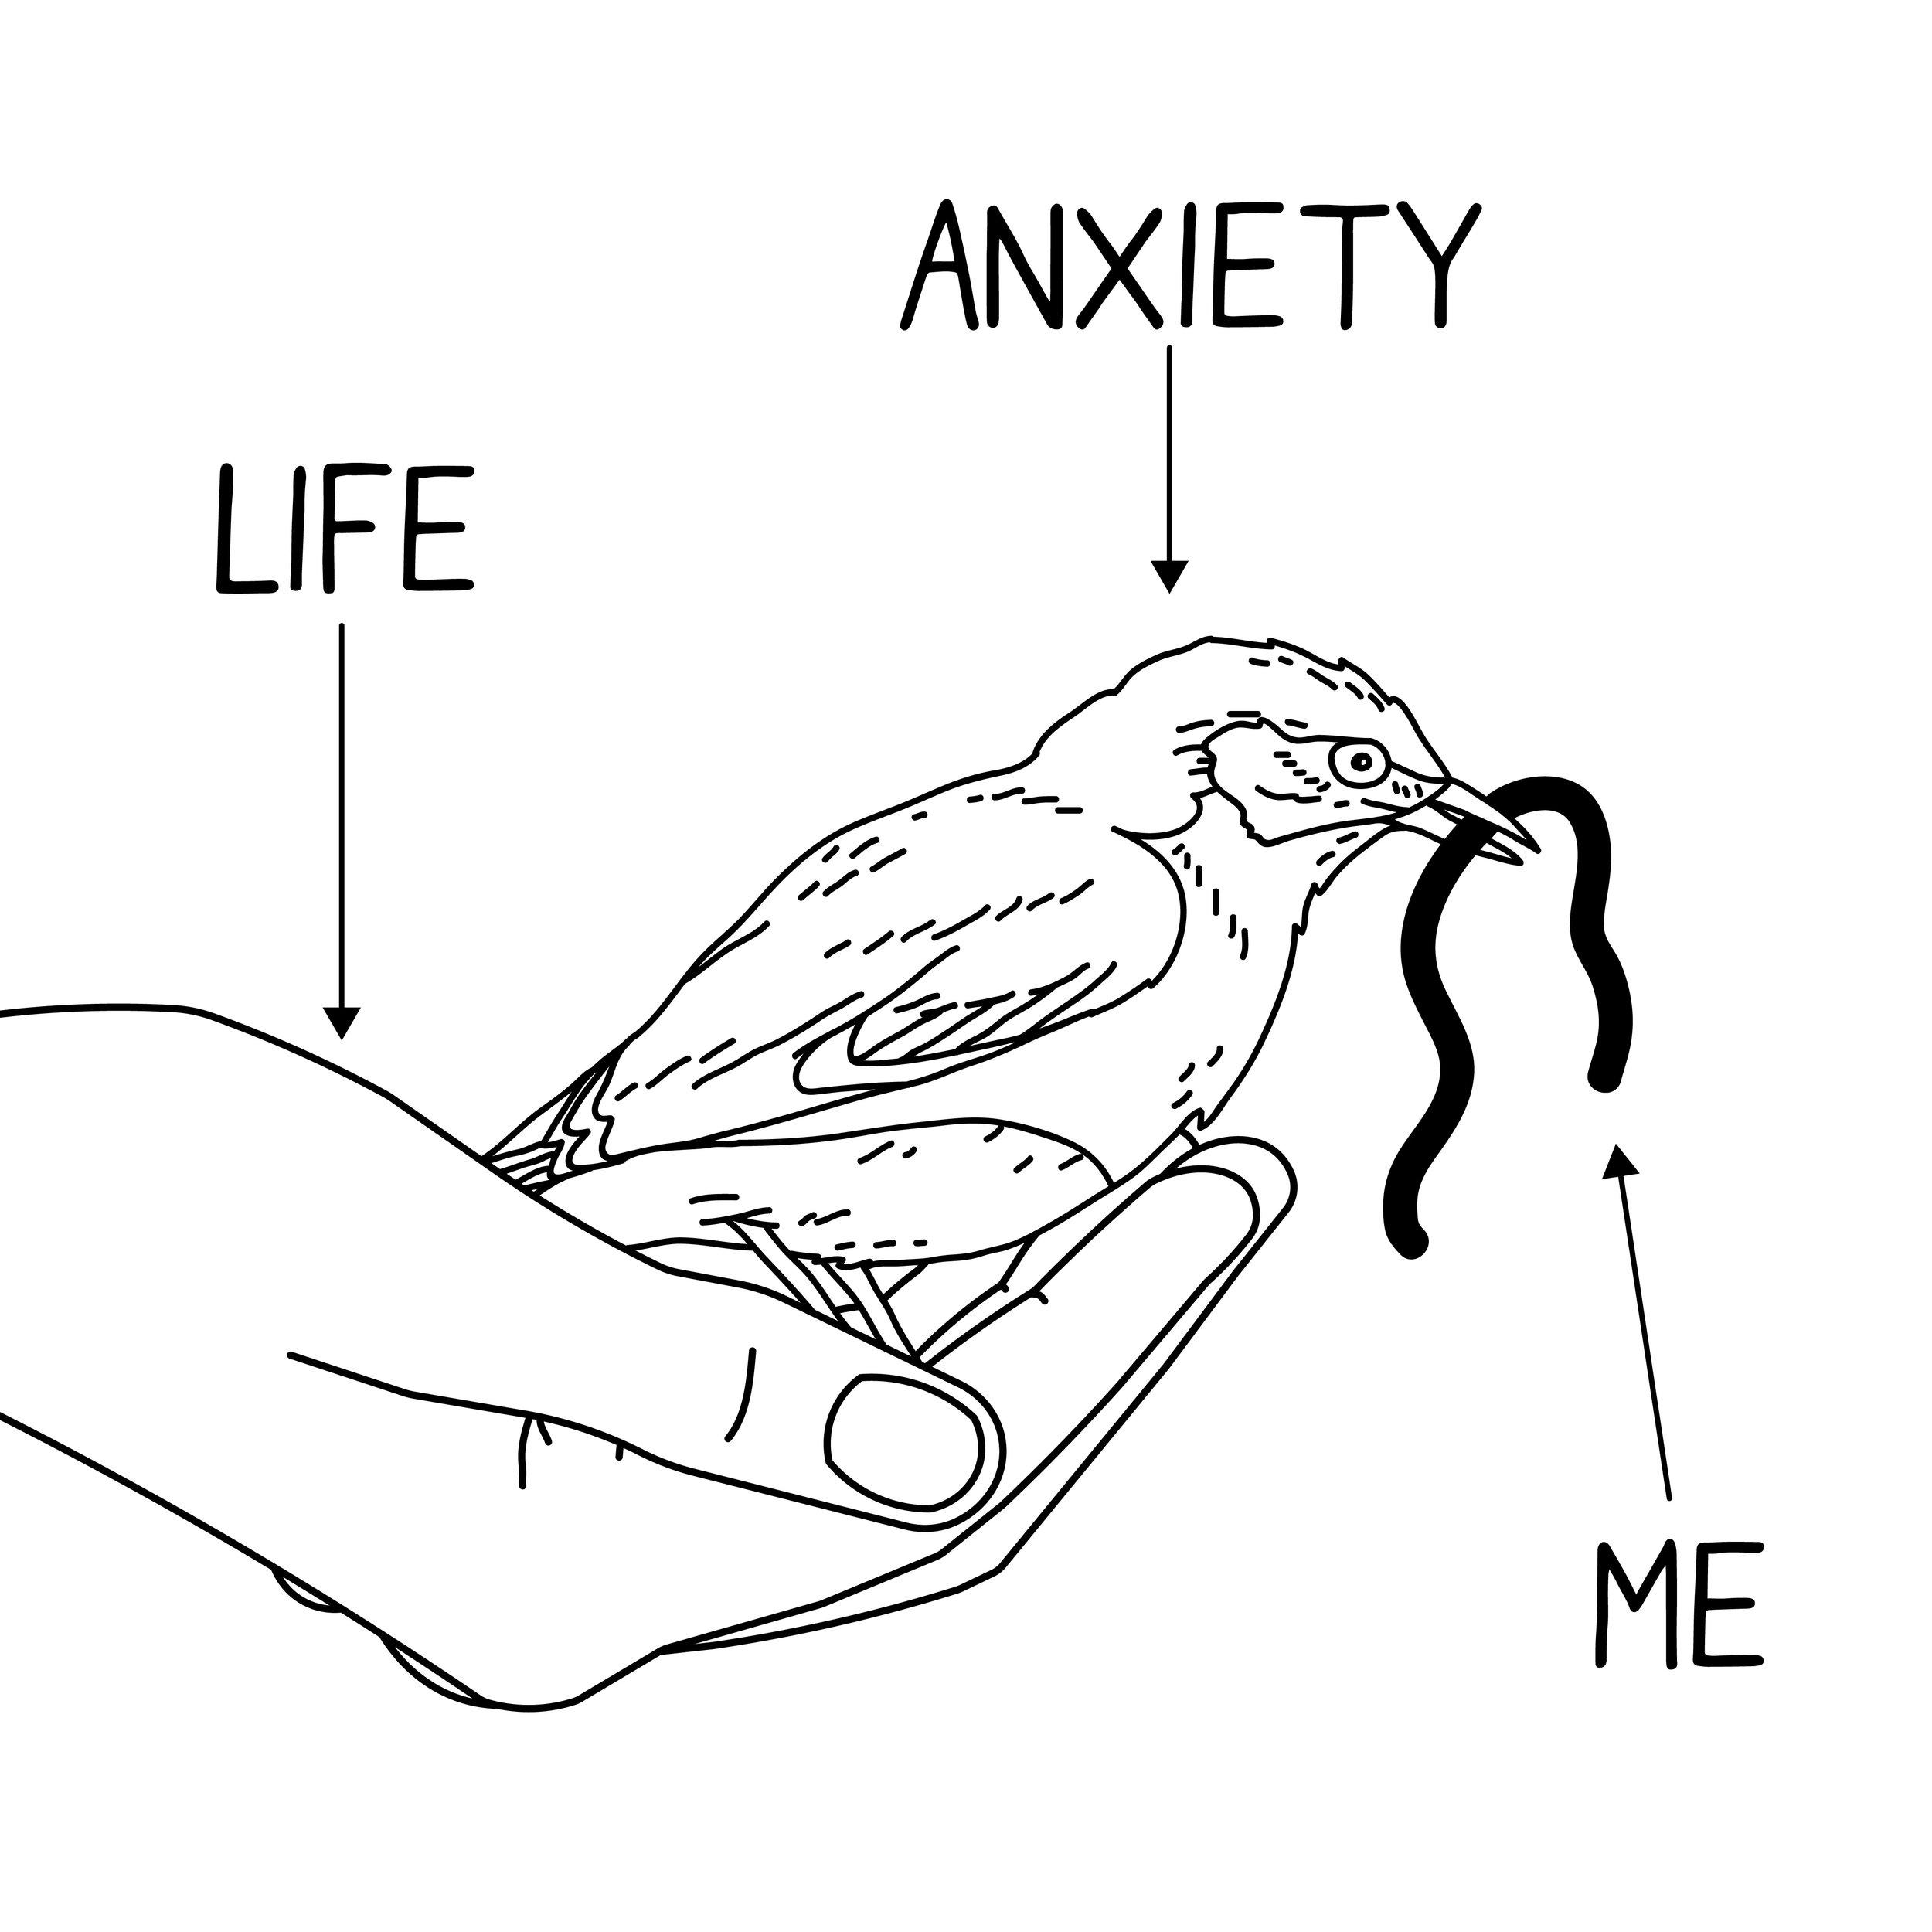 lifeanxietyme-01.jpg